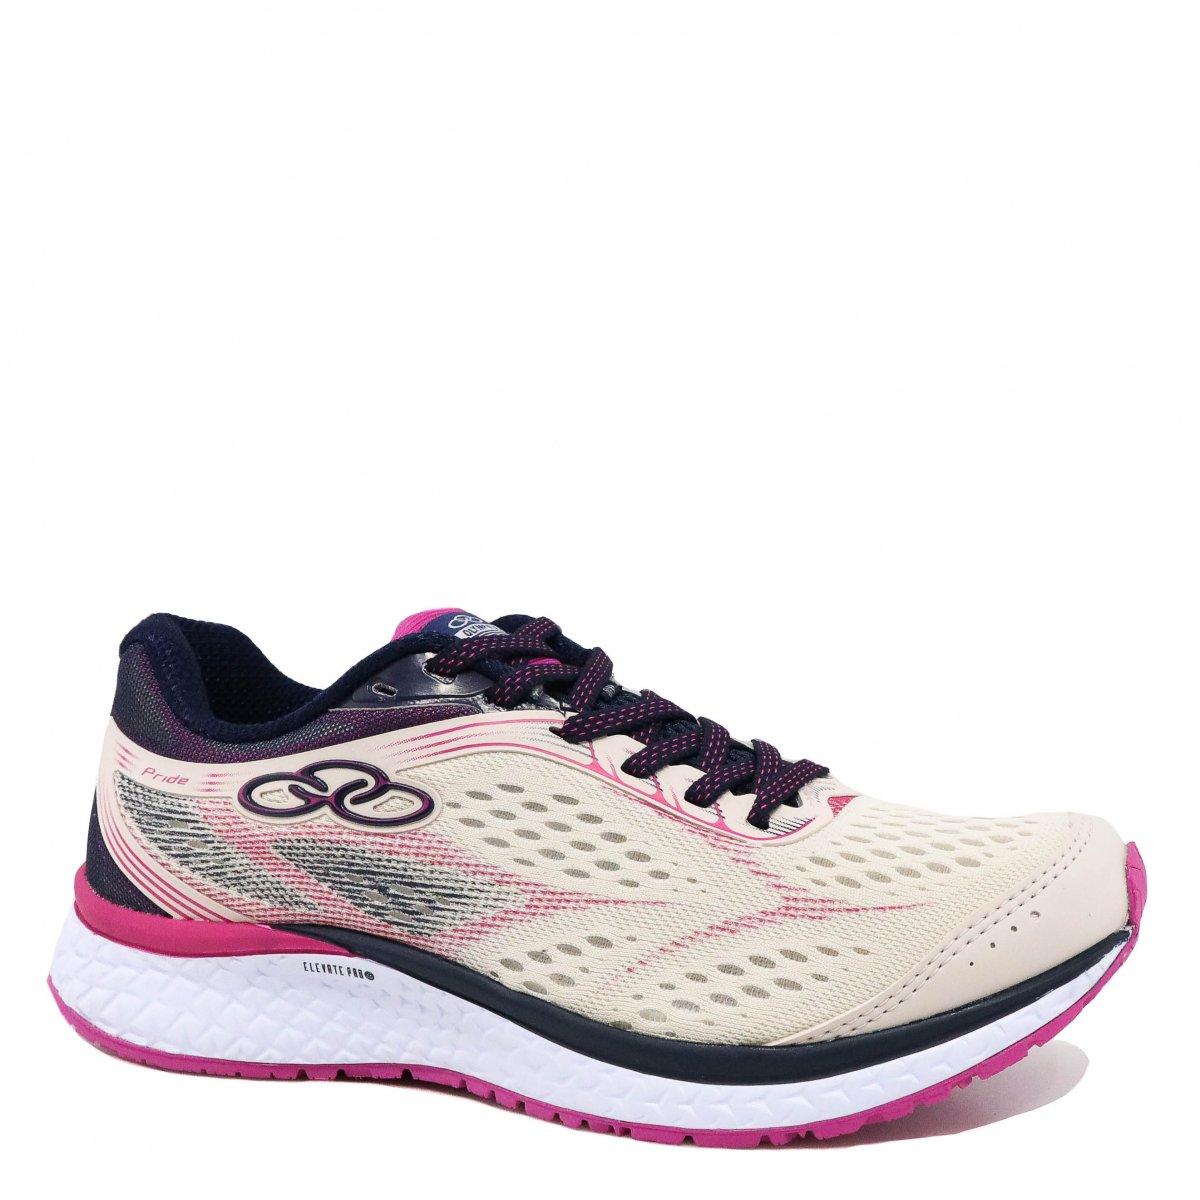 326c650426 Tênis Olympikus Pride Running PRIDE